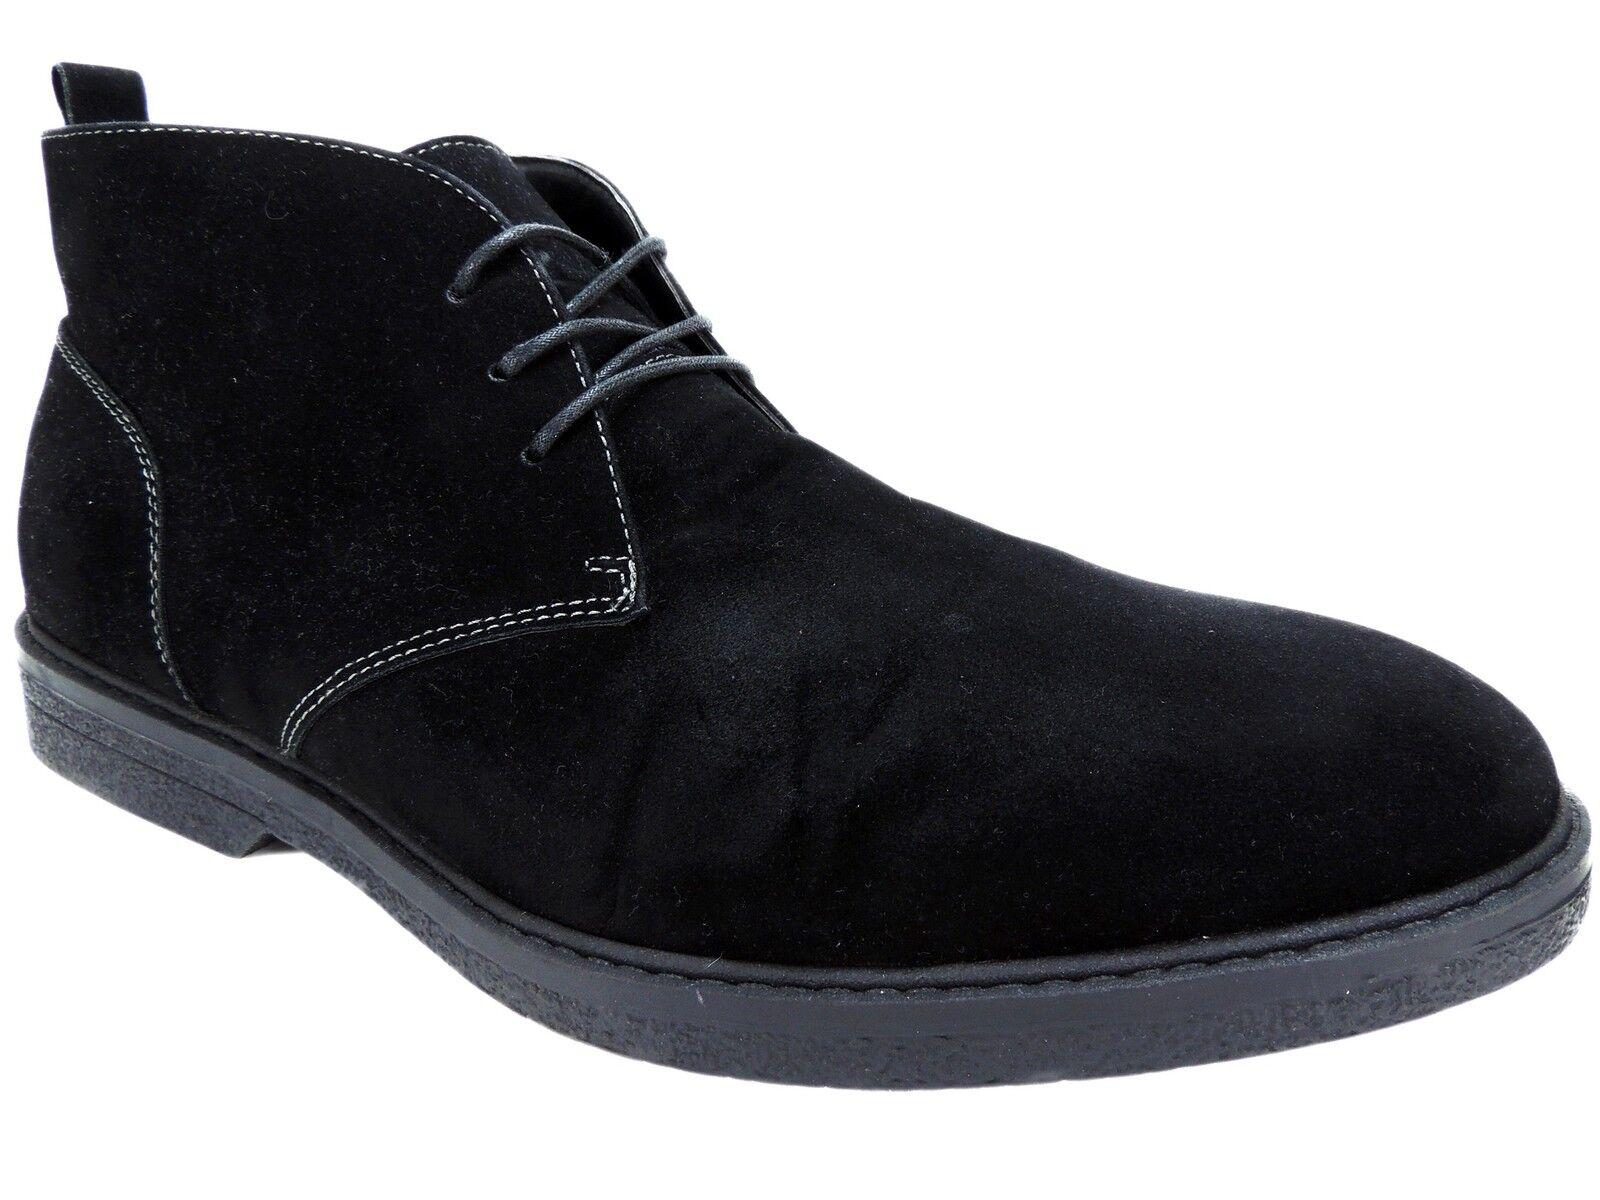 Alfani Men's Tripp Chukka Boots Black PU Suede Size 13 M